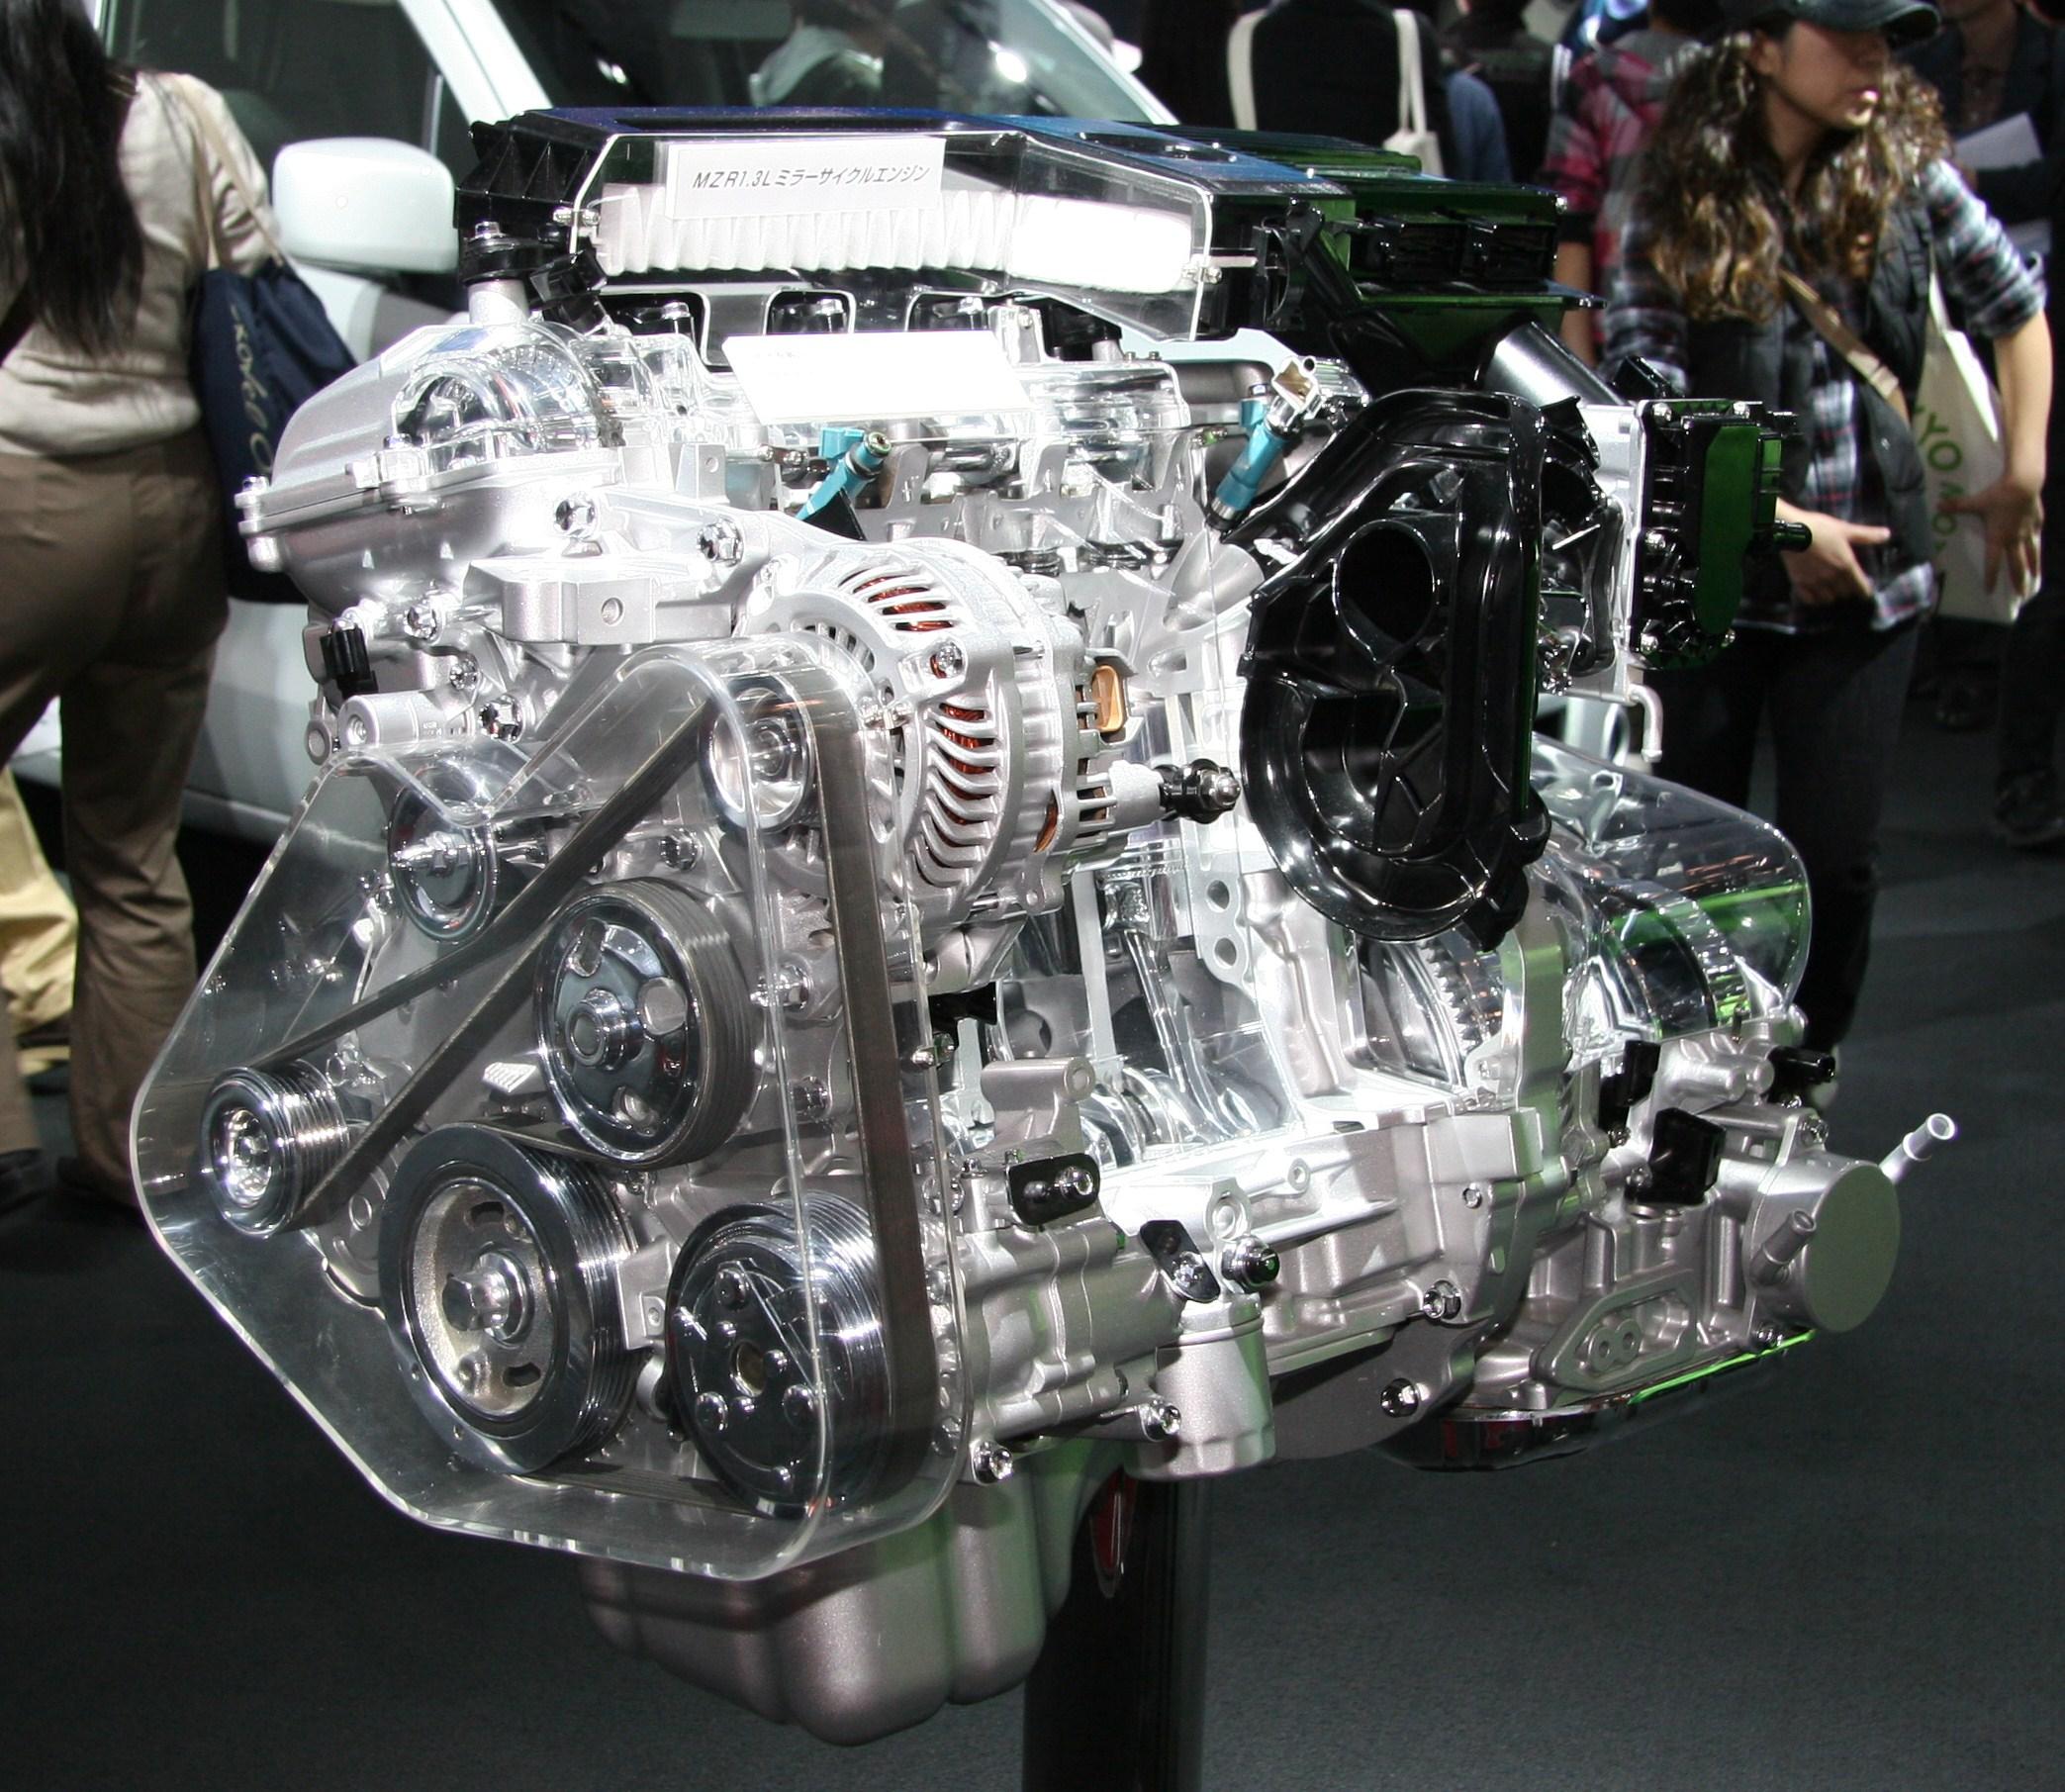 Vem Motor Wiring Diagram : Nissan frontier oil filter location get free image